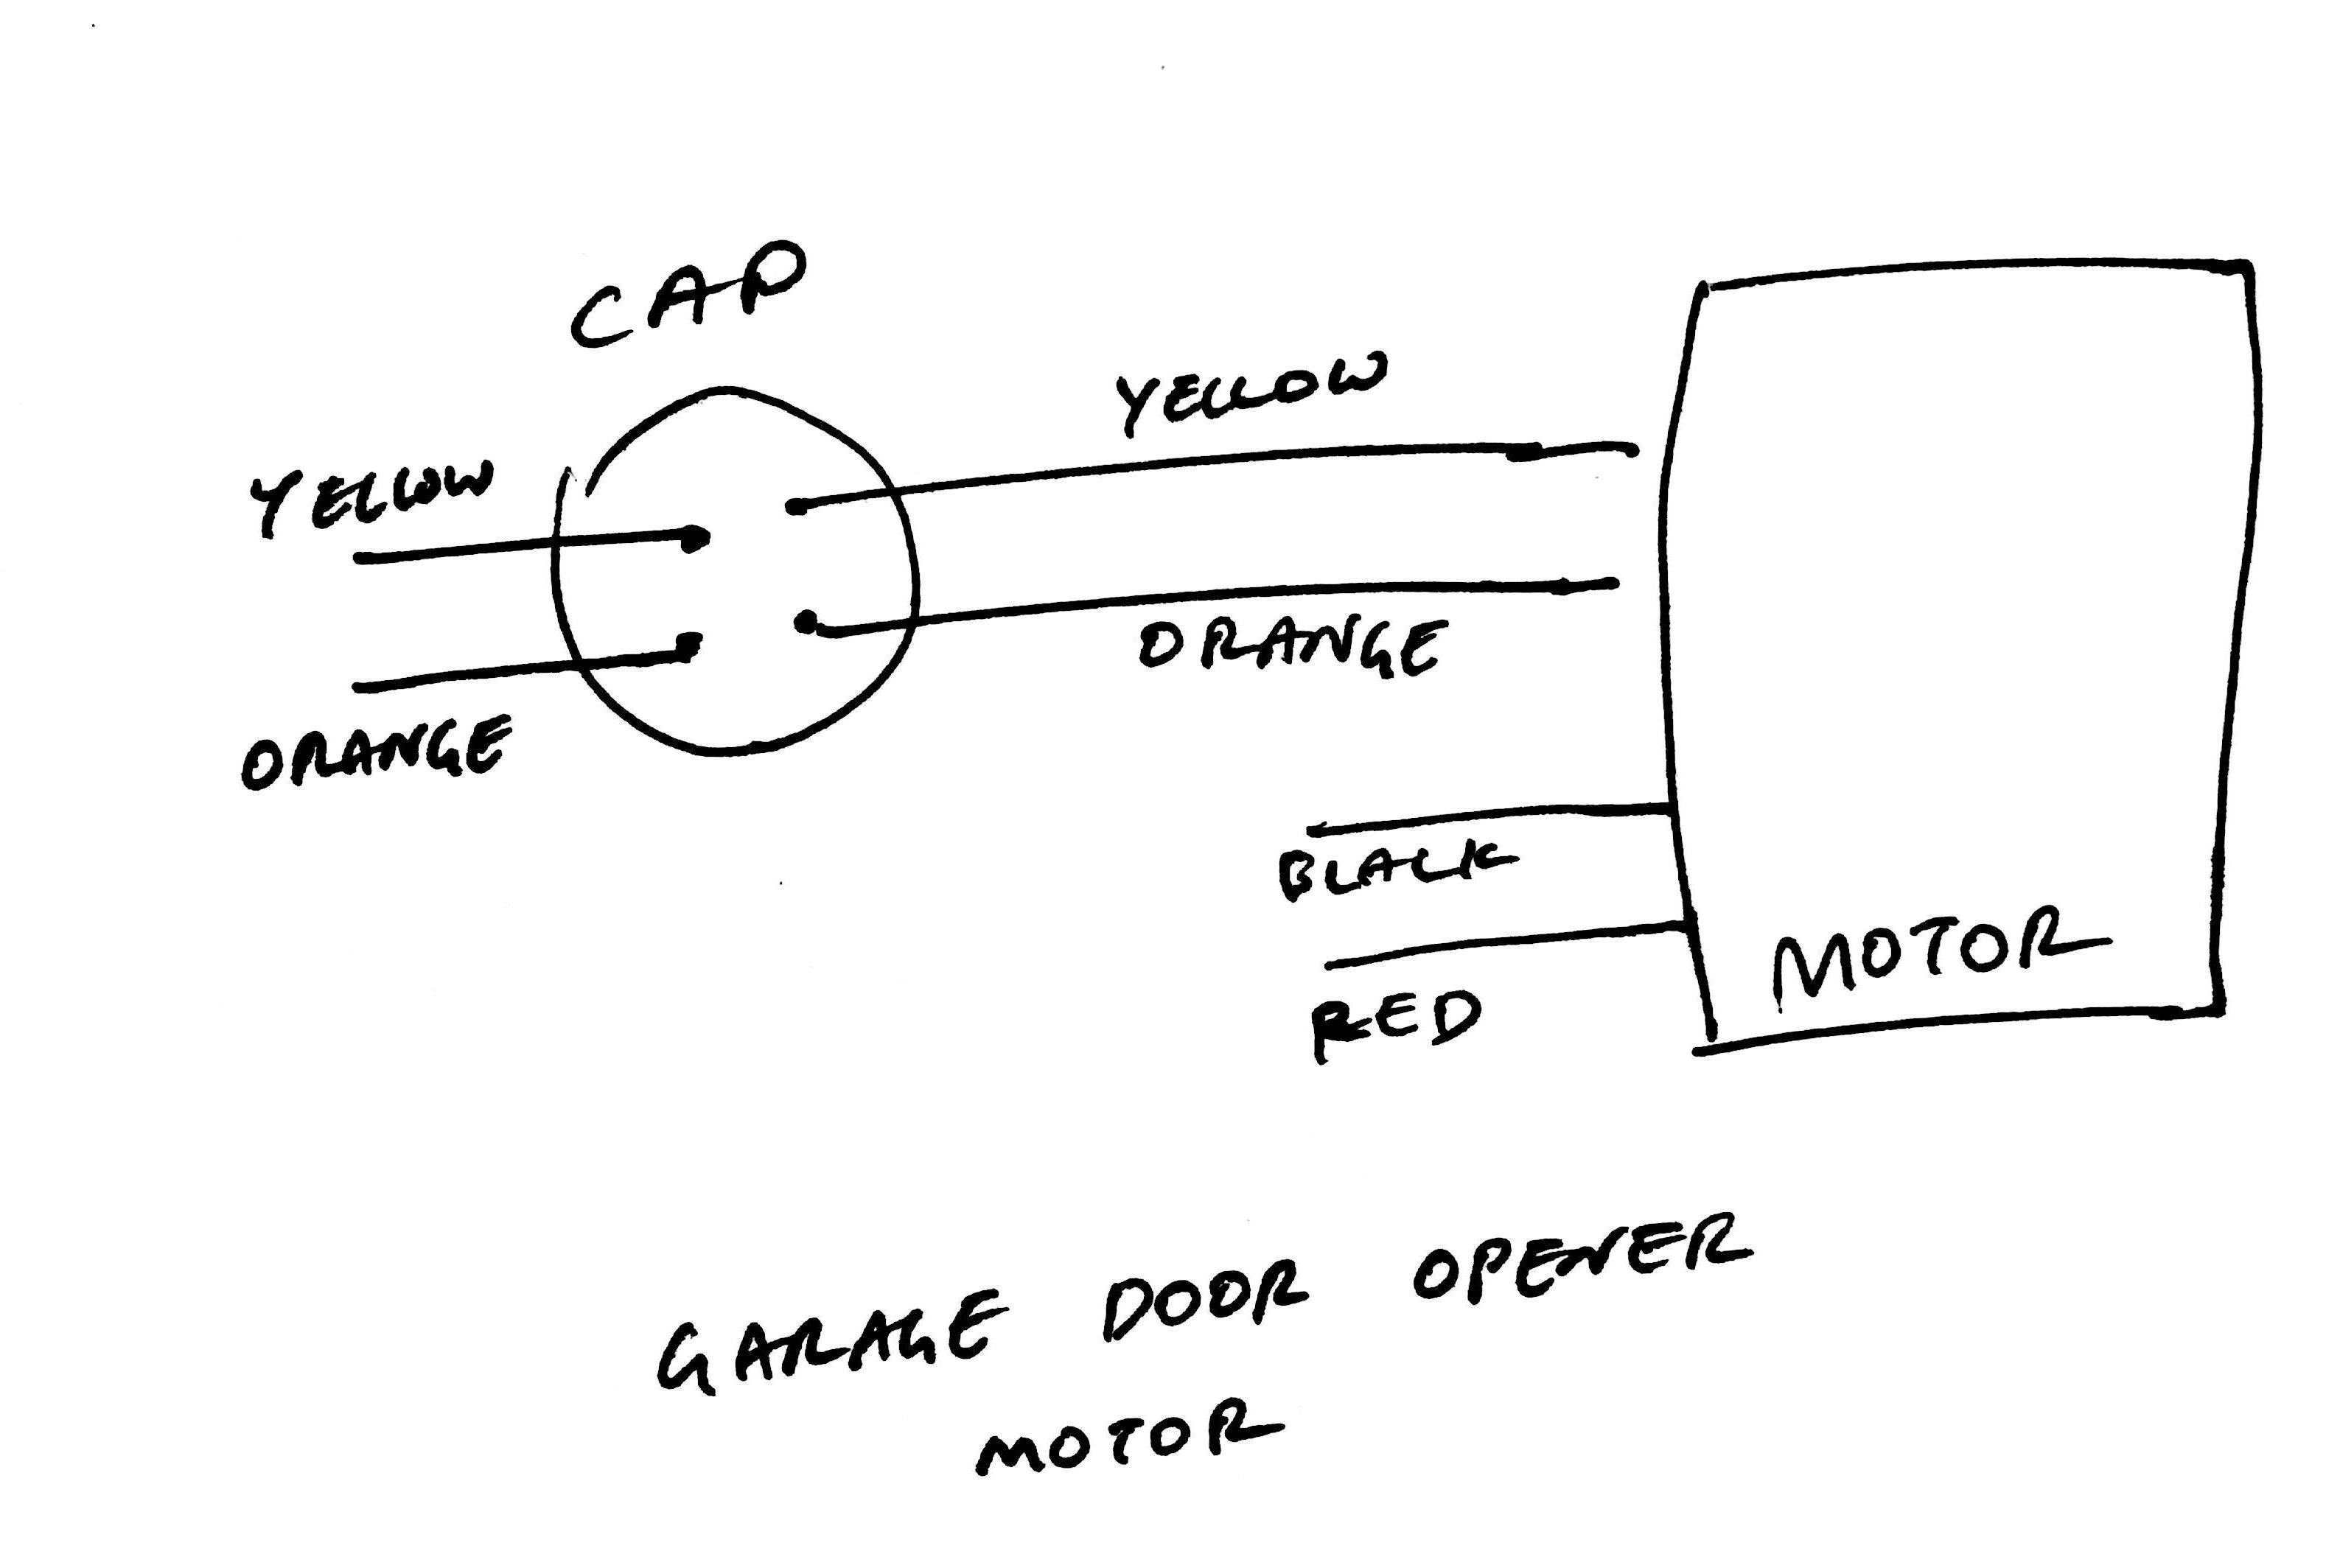 Unique Electric Fan Motor Wiring Diagram Pdf #diagram #diagramsample  #diagramtemplate #wiringdiagram #diagramchart #worksheet #worksheett… | Motor  dc, Caos, MotoresPinterest